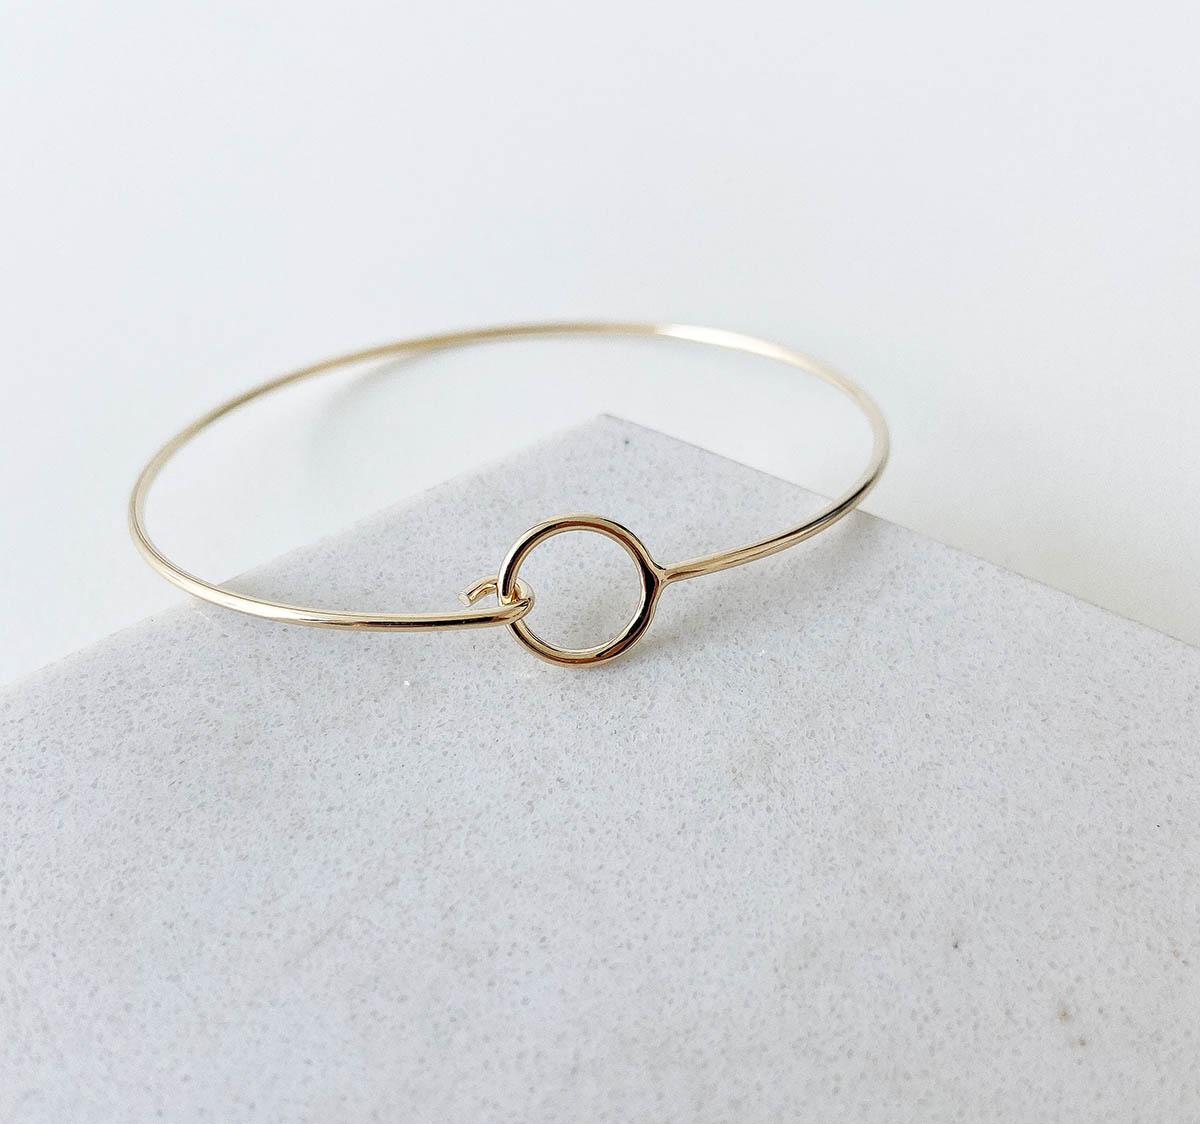 Bracelete Francoise Banhado a Ouro 18k Círculo Vazado